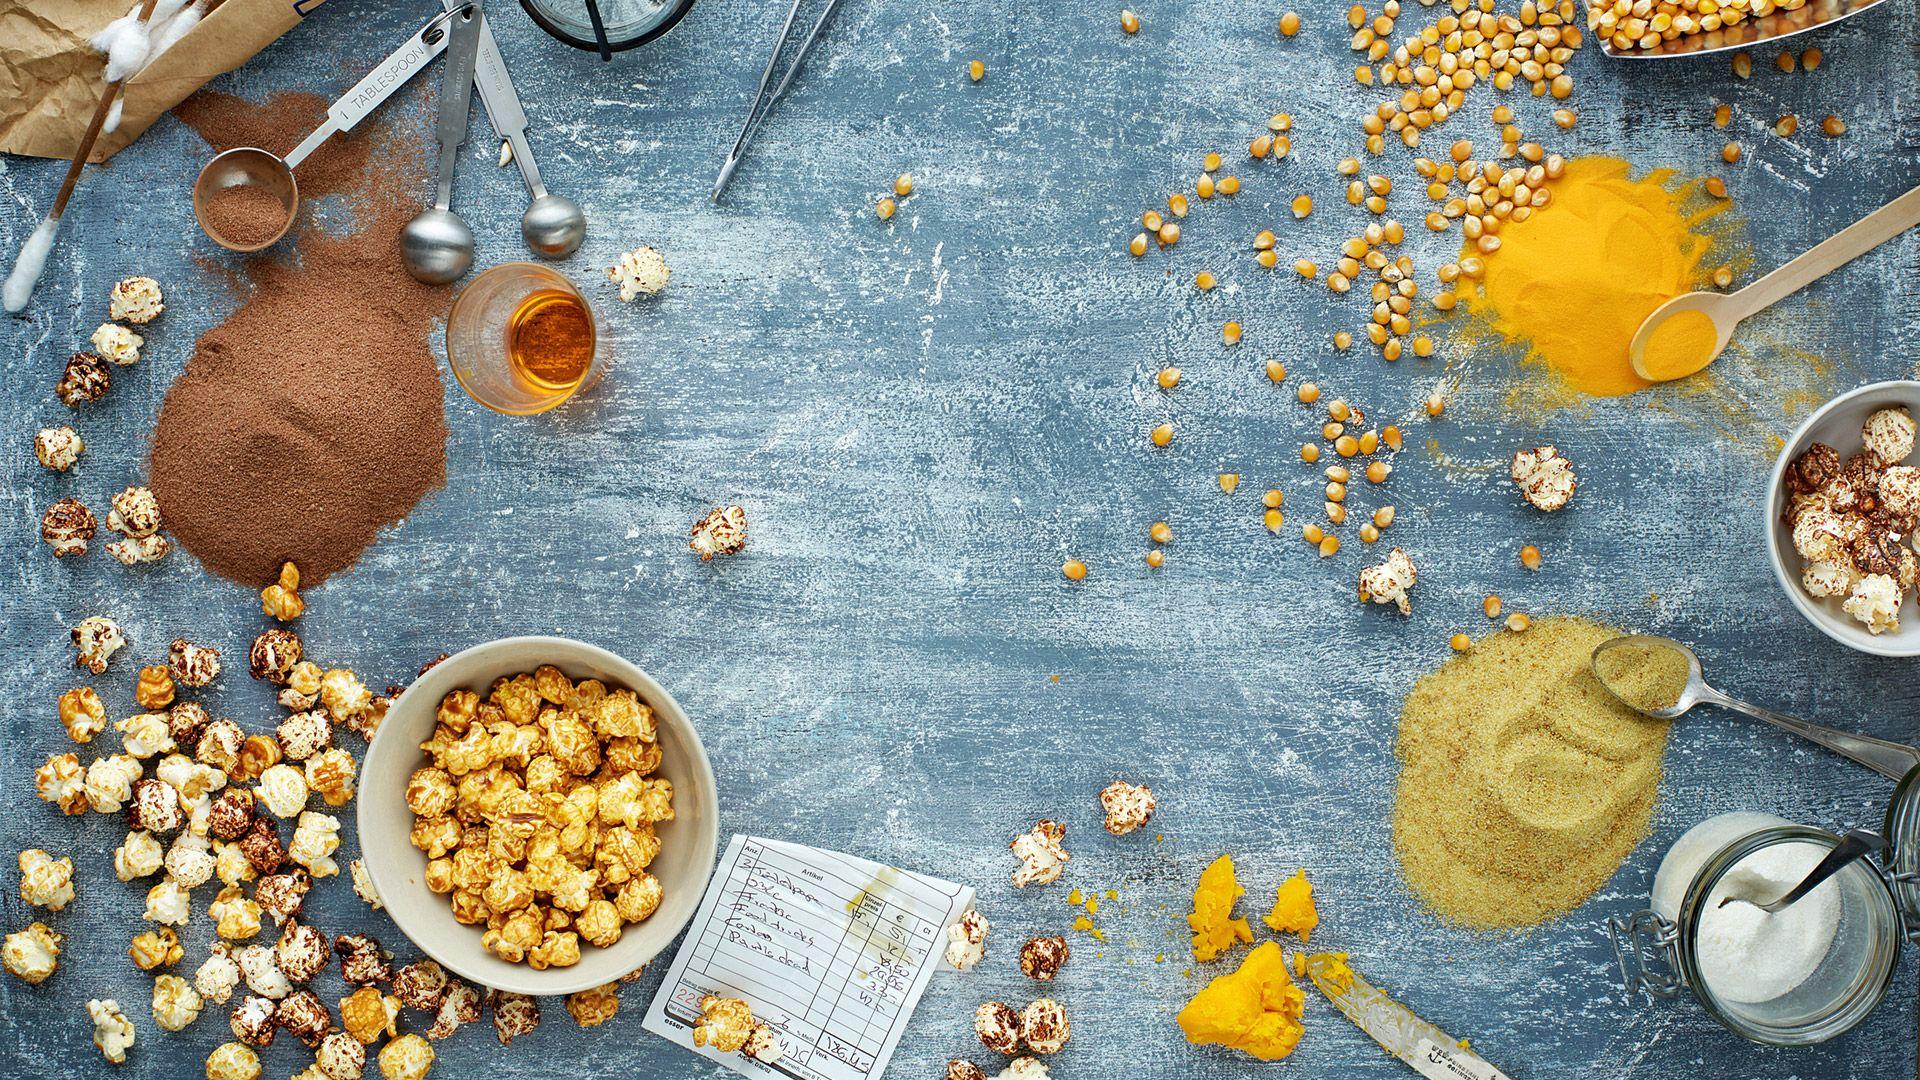 Corn full screen hd wallpaper